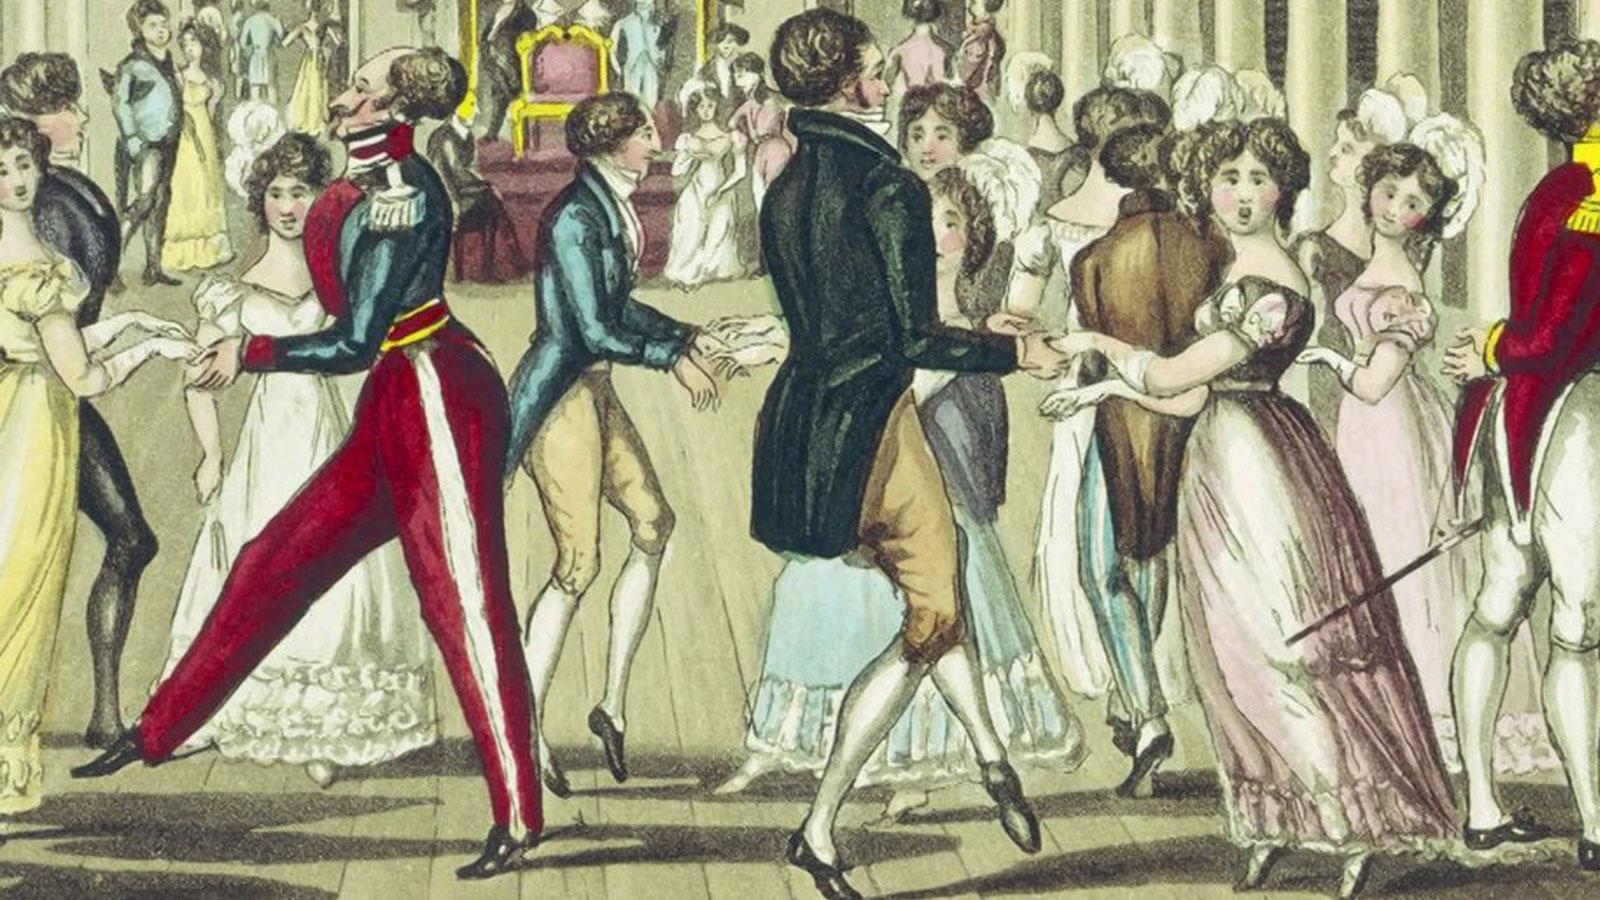 Jane Austen - Public and private space